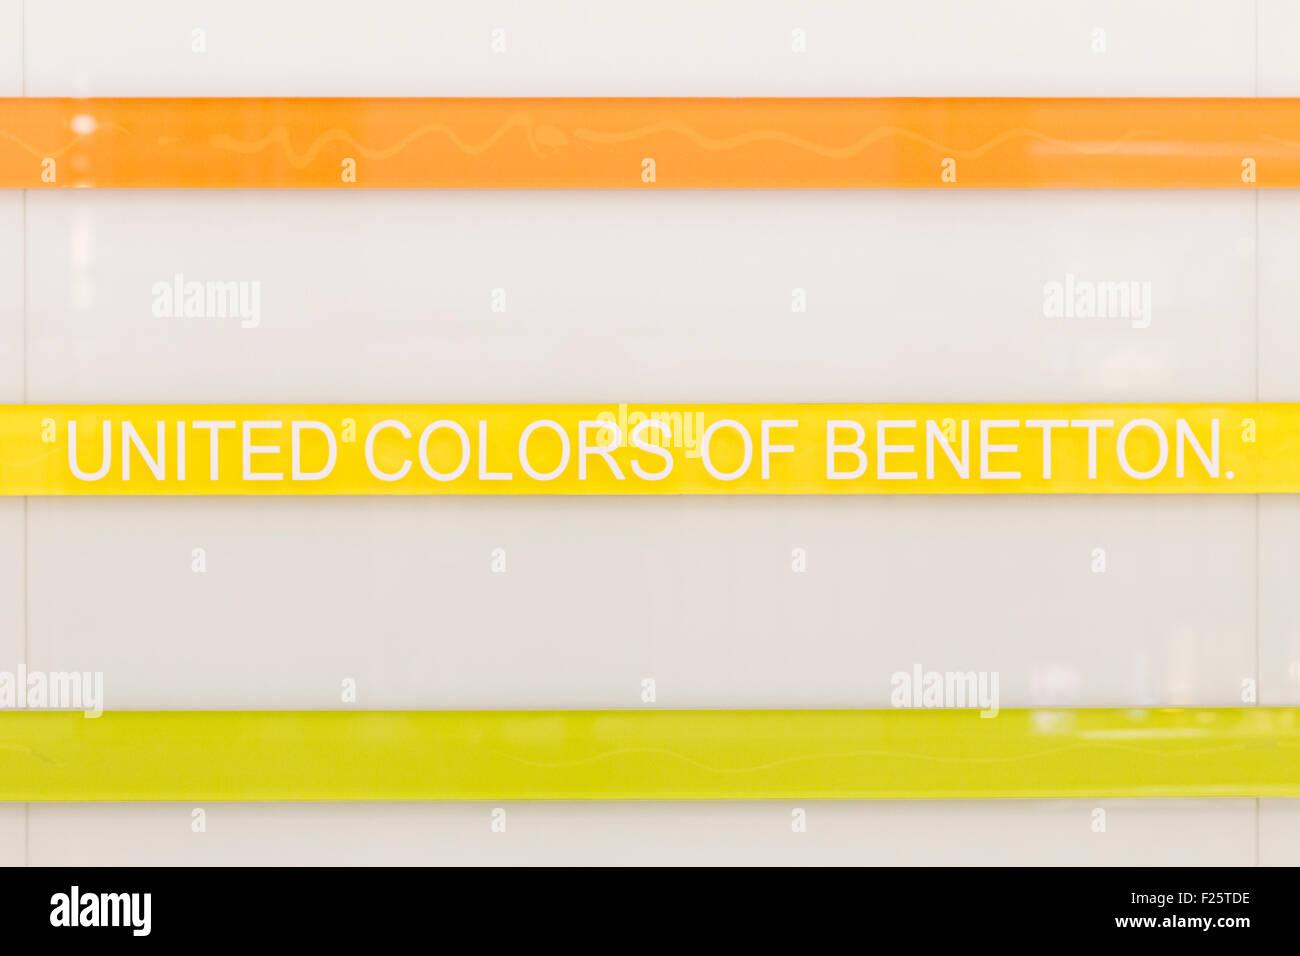 united colors of benetton logo